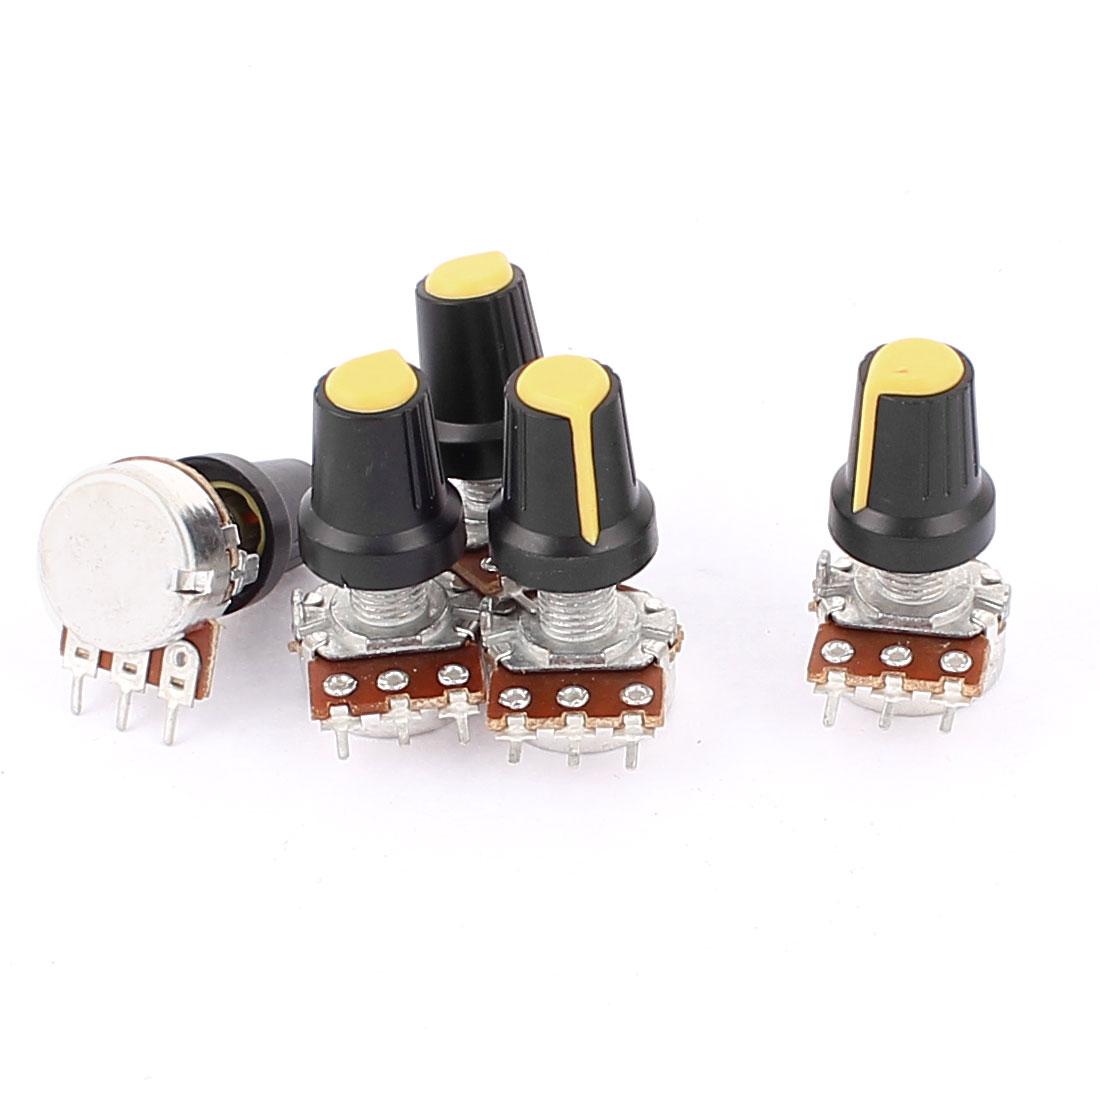 5 Pcs B10K 10K Ohm 3 Terminal Rotary Audio B Type Potentiometer Pot Height 31cm